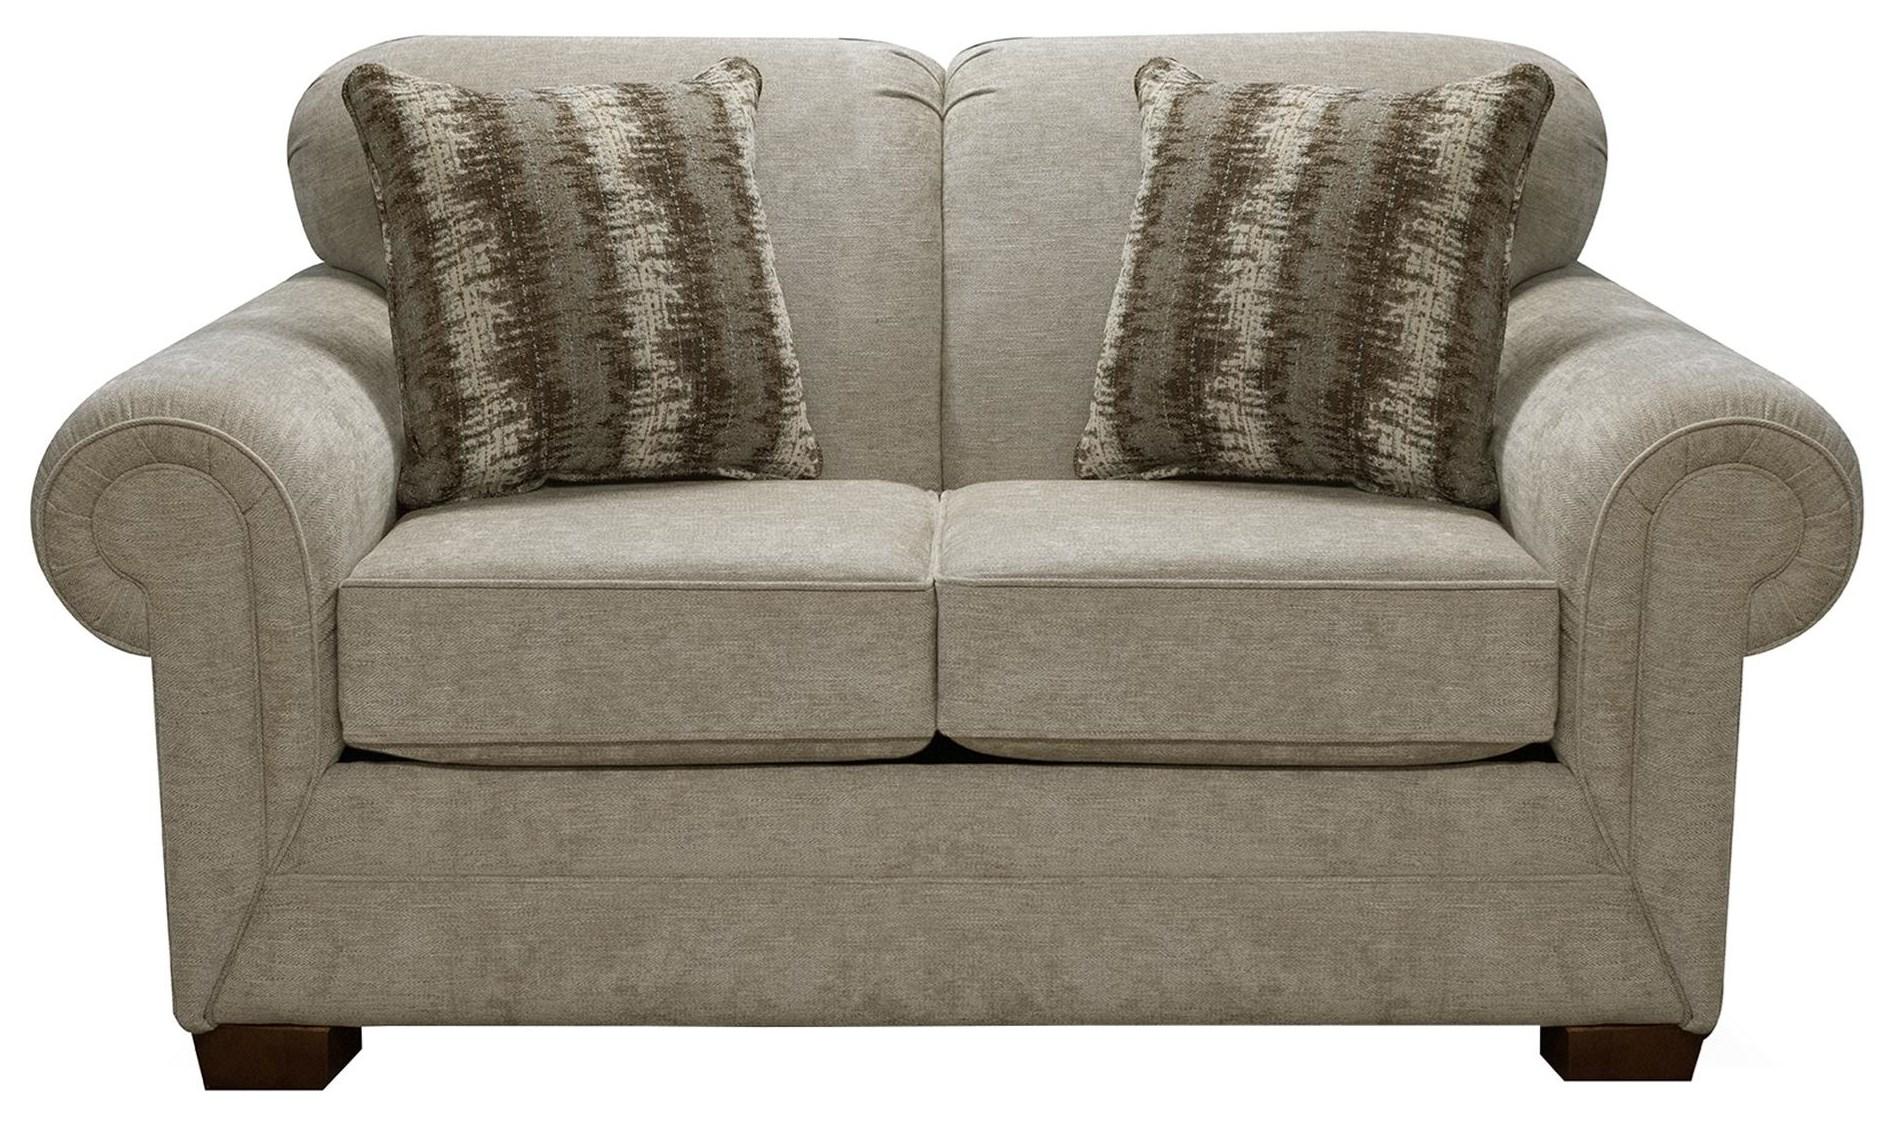 42504 Upholstered Loveseat by England at Sadler's Home Furnishings